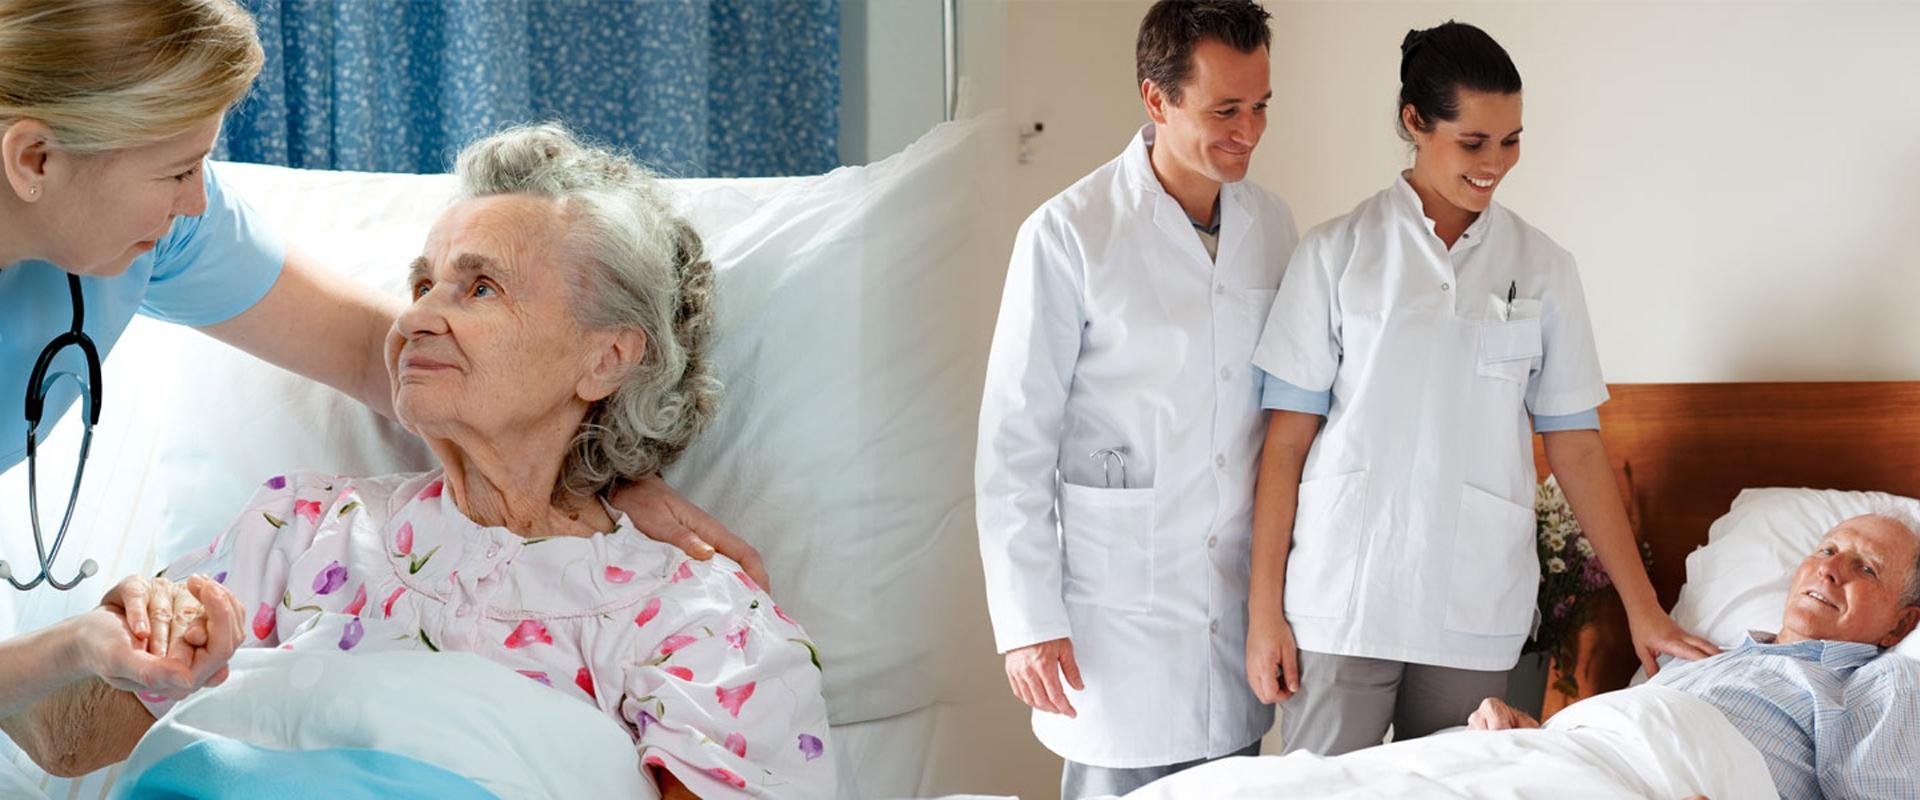 Tracheostomy Care In Nursing Homes